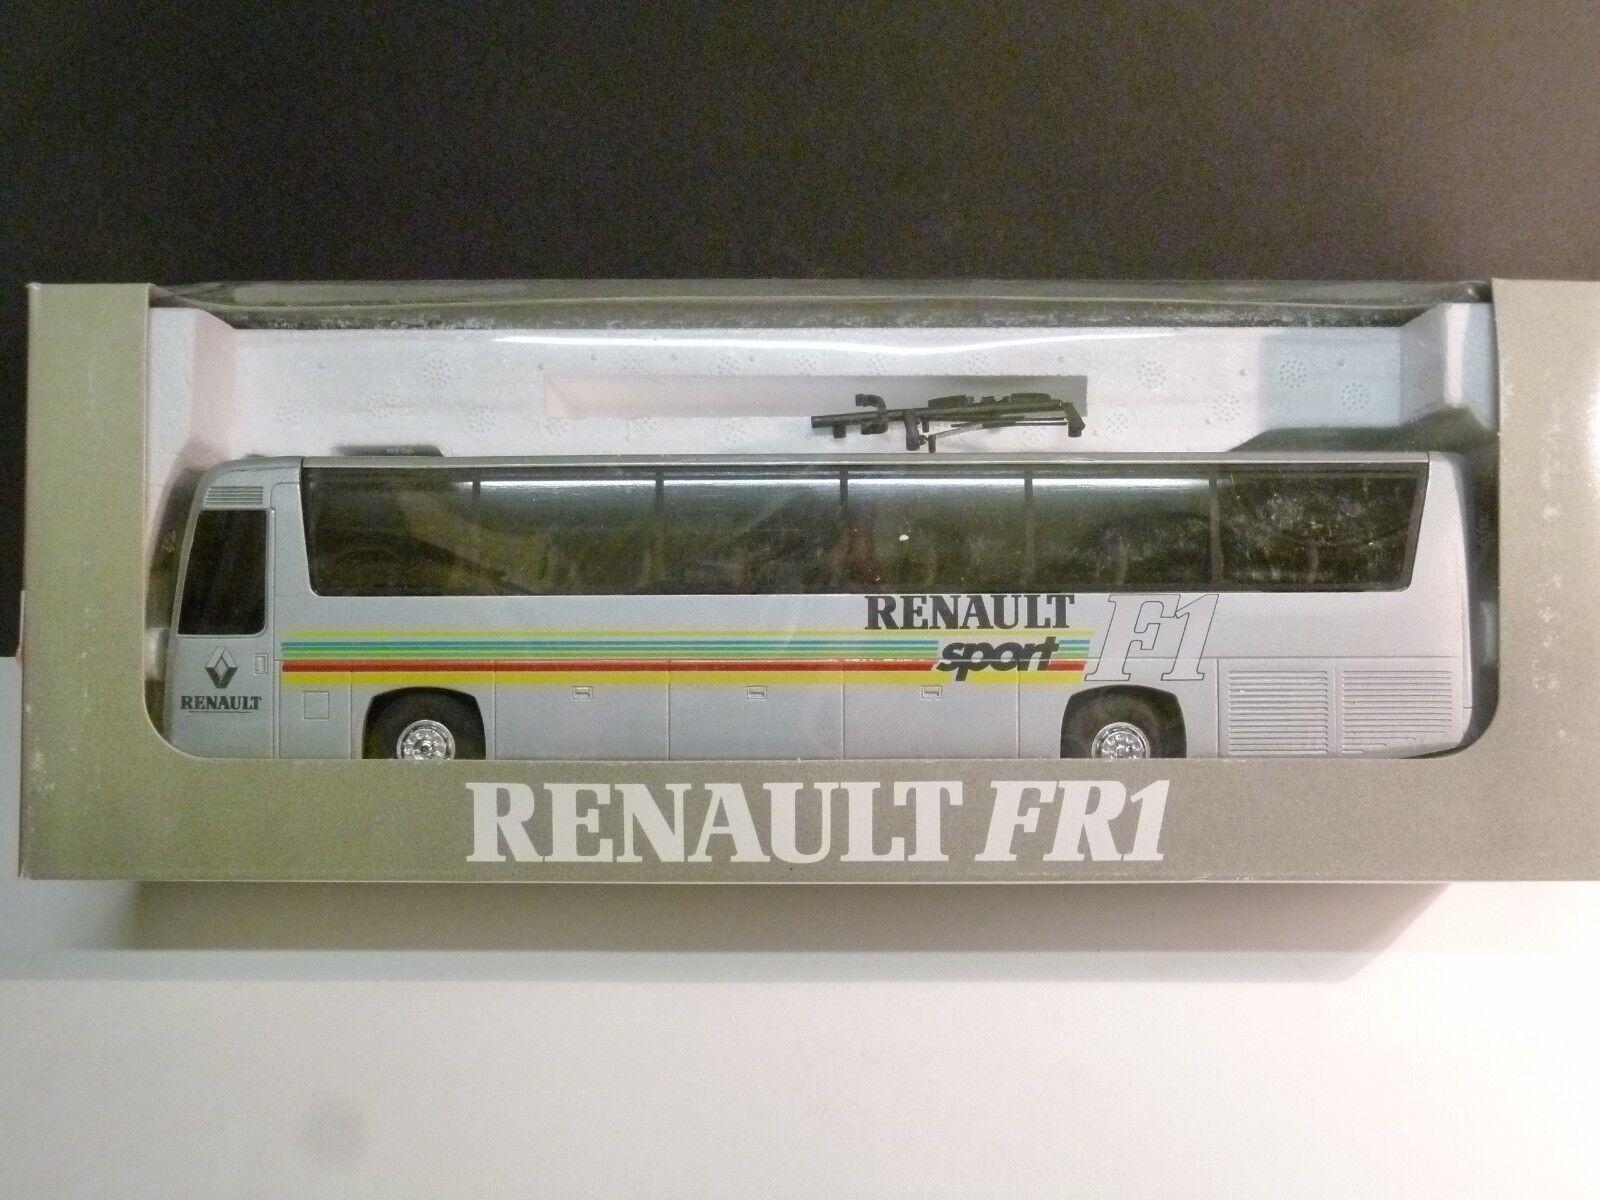 Für renault sport f1 - auto fr1 louis surber eligor 7711148023 uso ref.